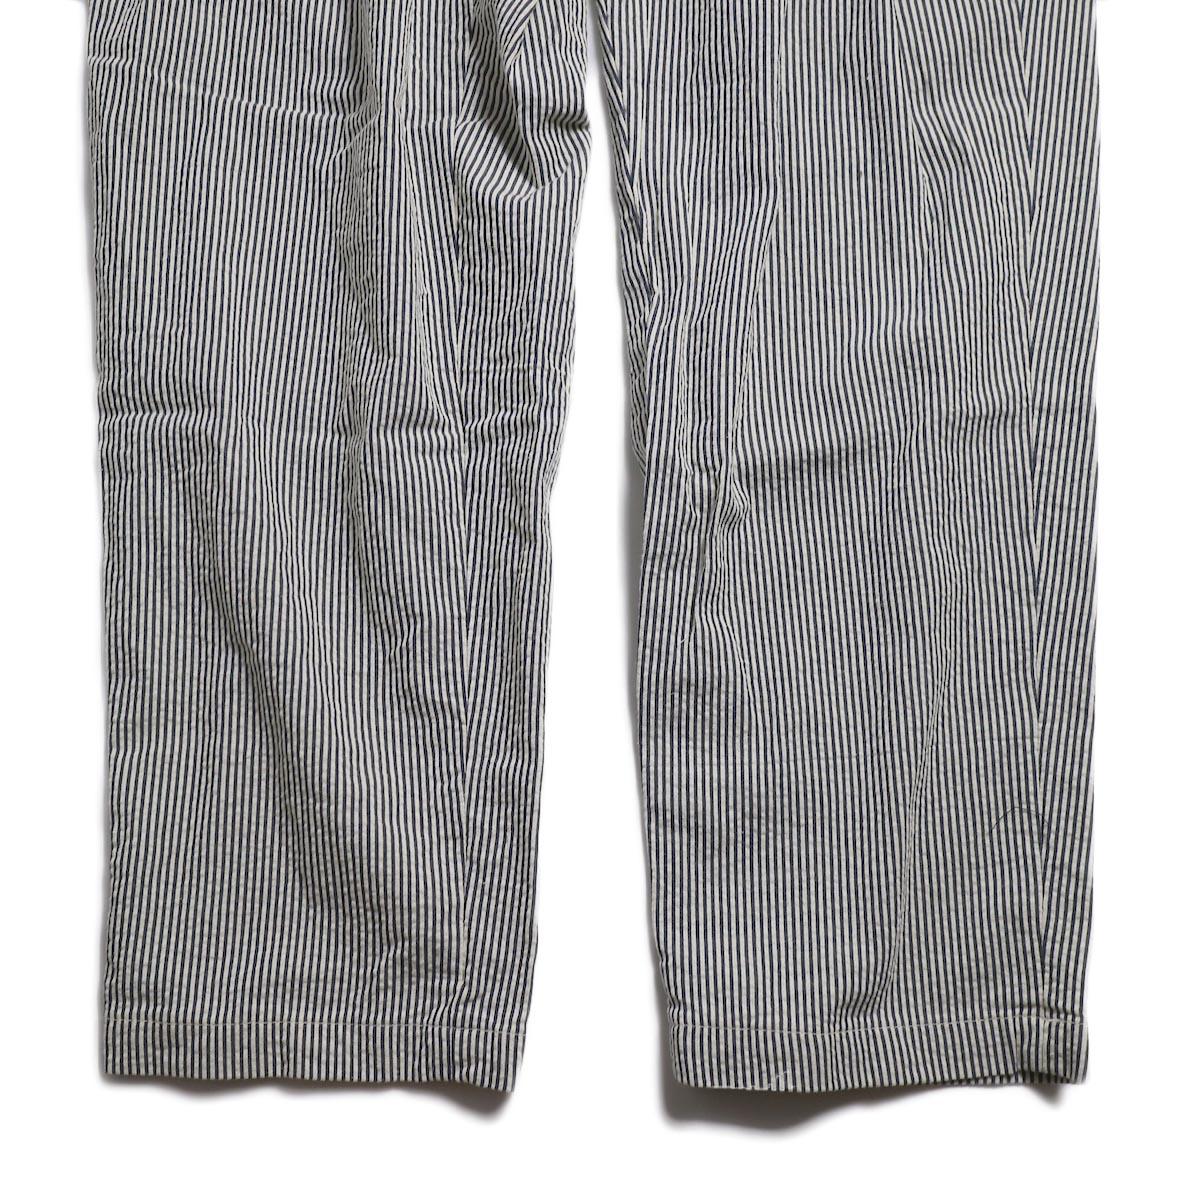 ENGINEERED GARMENTS / Emerson Pant -Seersucker St. (Navy) 裾